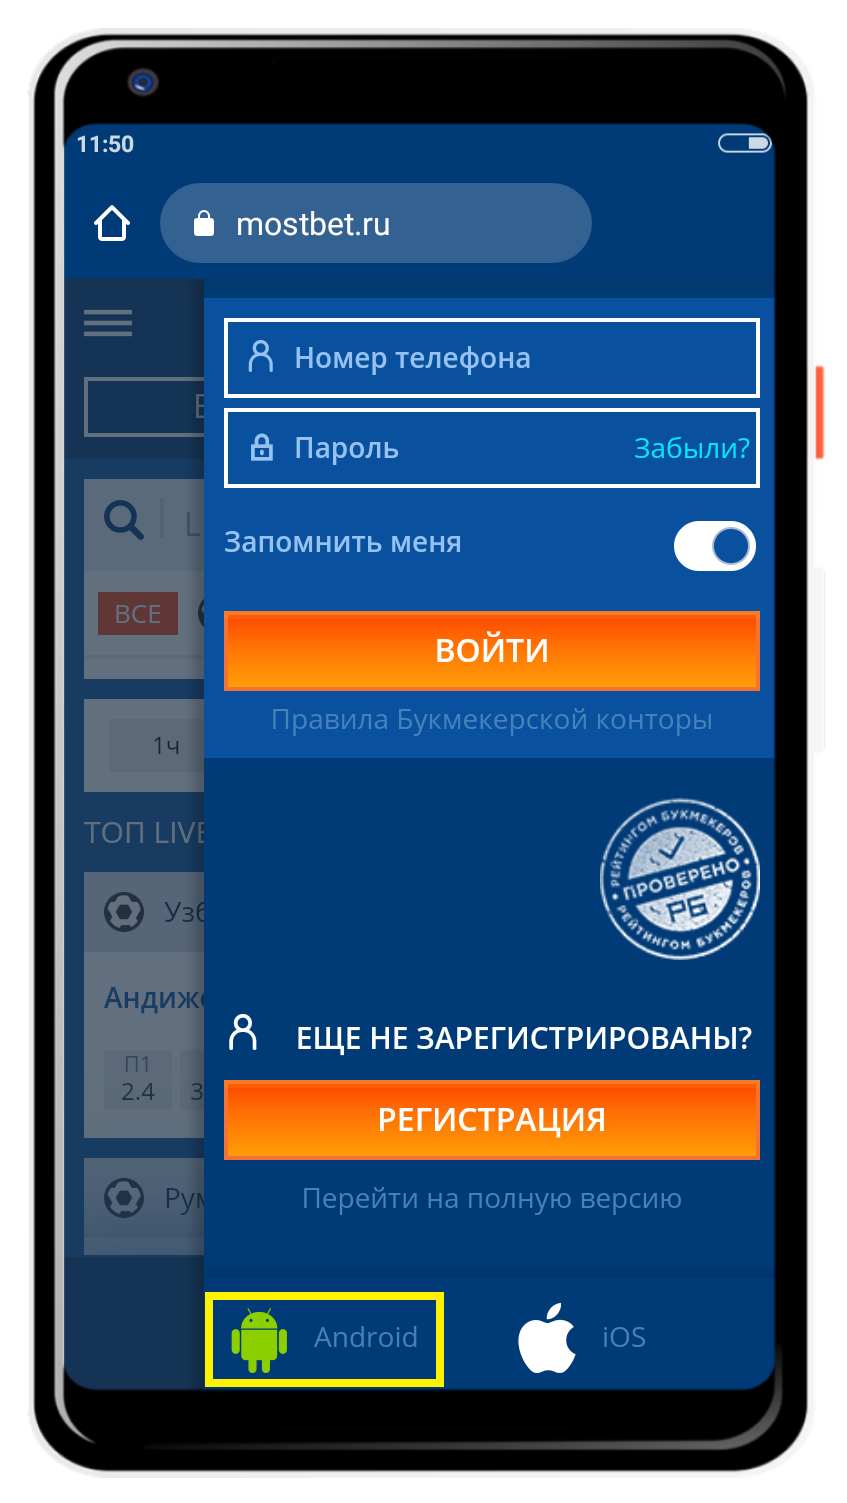 скачивание с телефона вндроид приложения мостбет